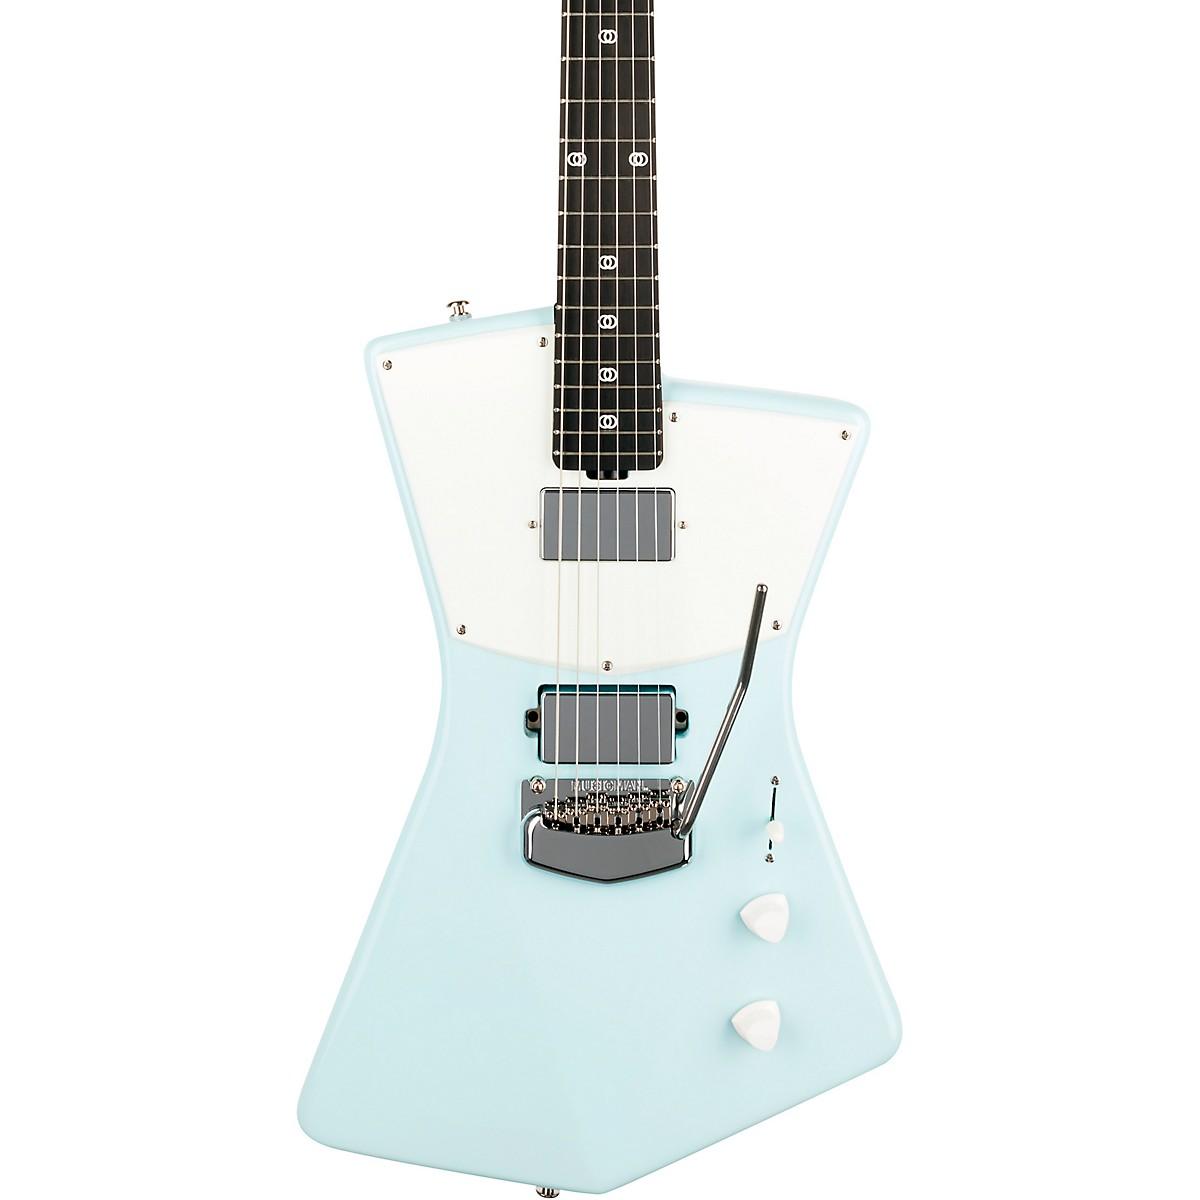 Ernie Ball Music Man St. Vincent HH Ebony Fingerboard Electric Guitar